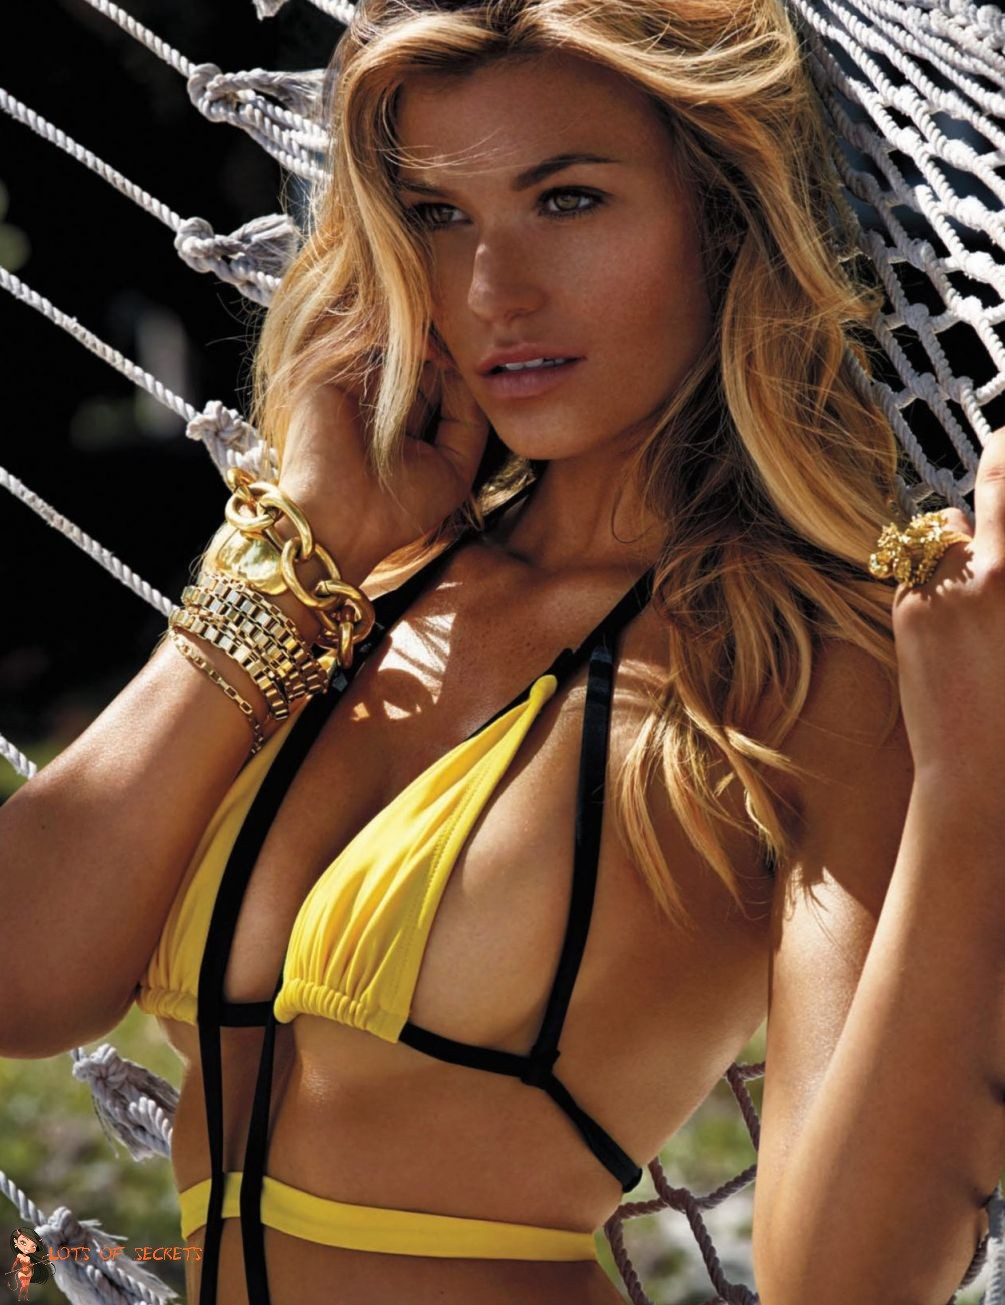 Samantha Hoopes Posing in a Slutty Tight Yellow Bikini